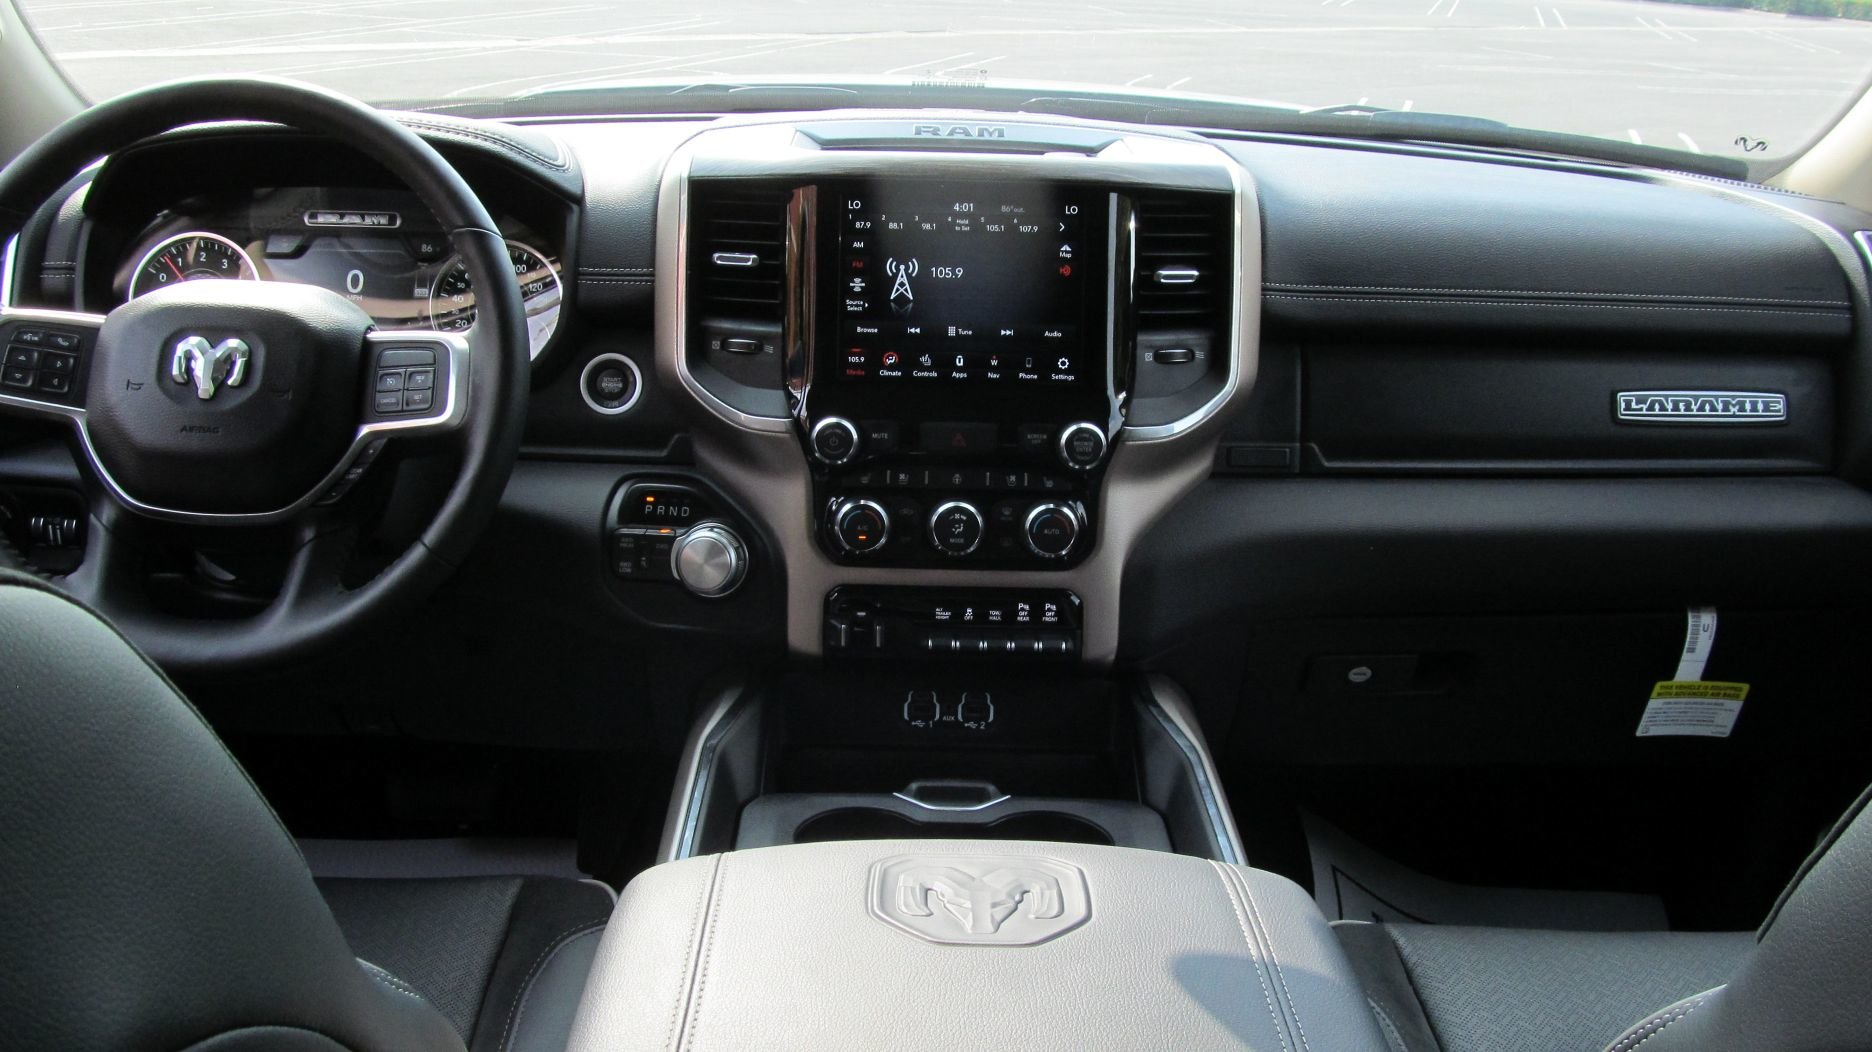 2019 Dodge RAM 2500 HD 6.4L V8 Laramie Crew Cab 4x4 For Sale (picture 4 of 6)